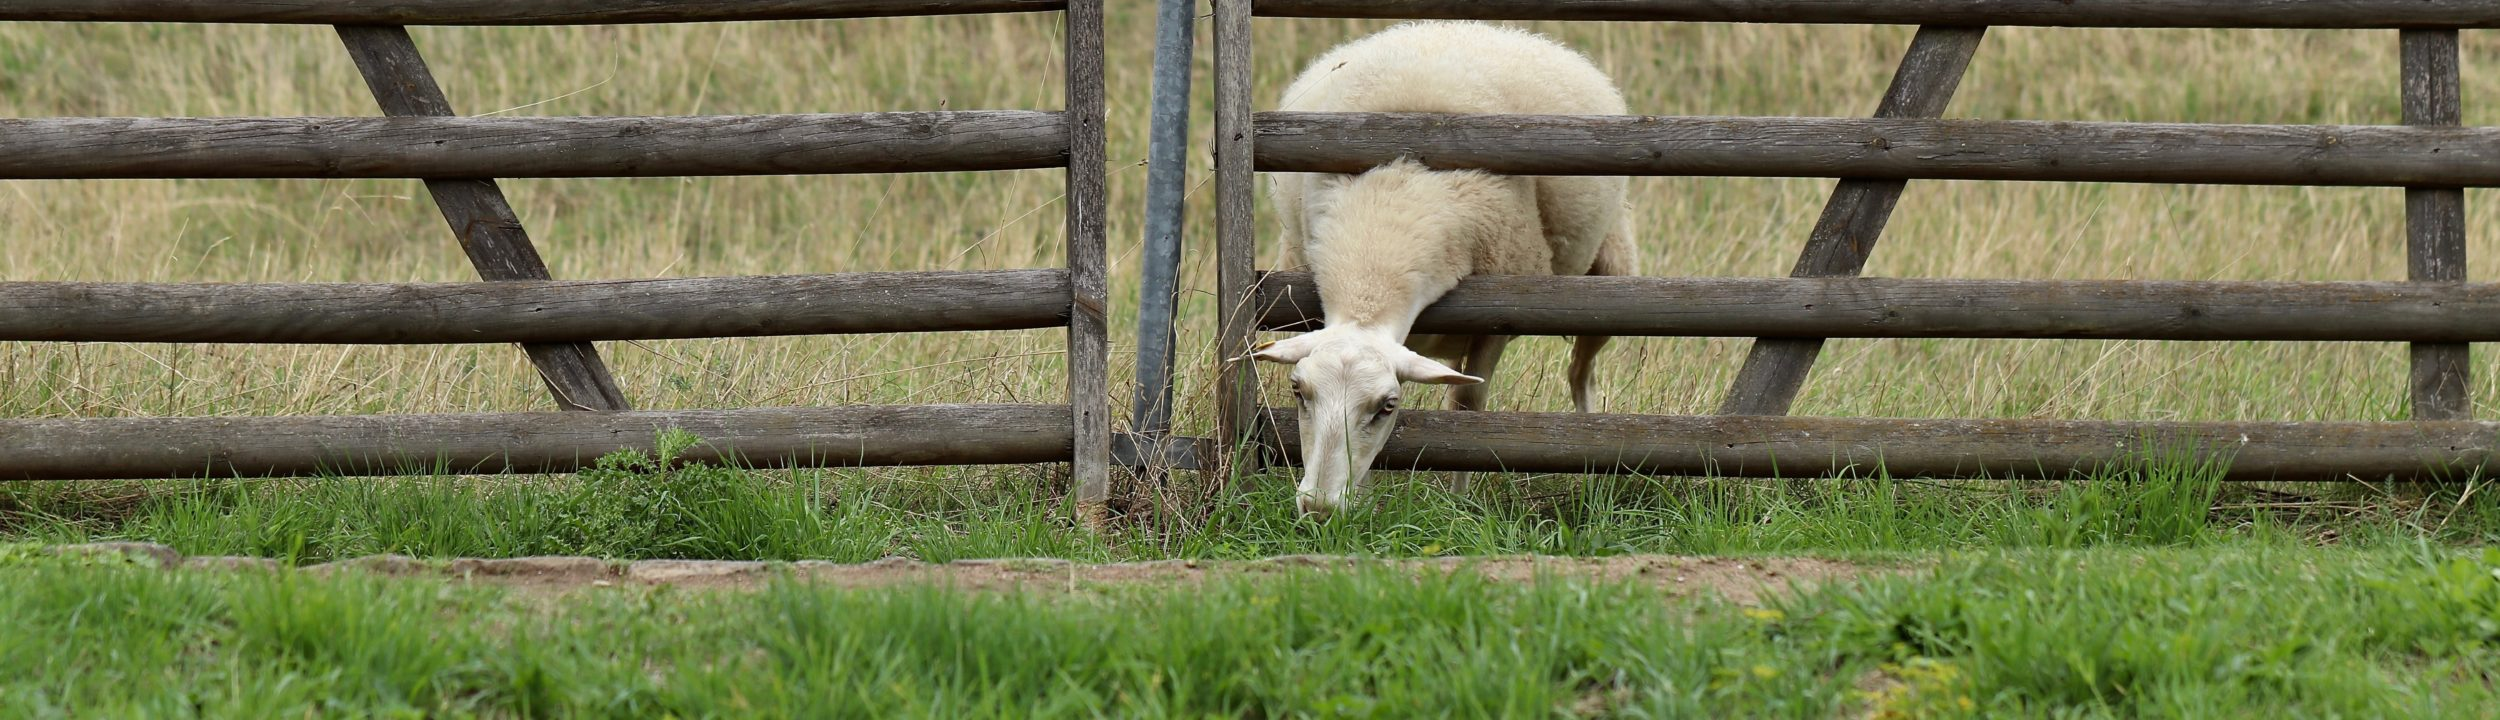 sheep-4461377